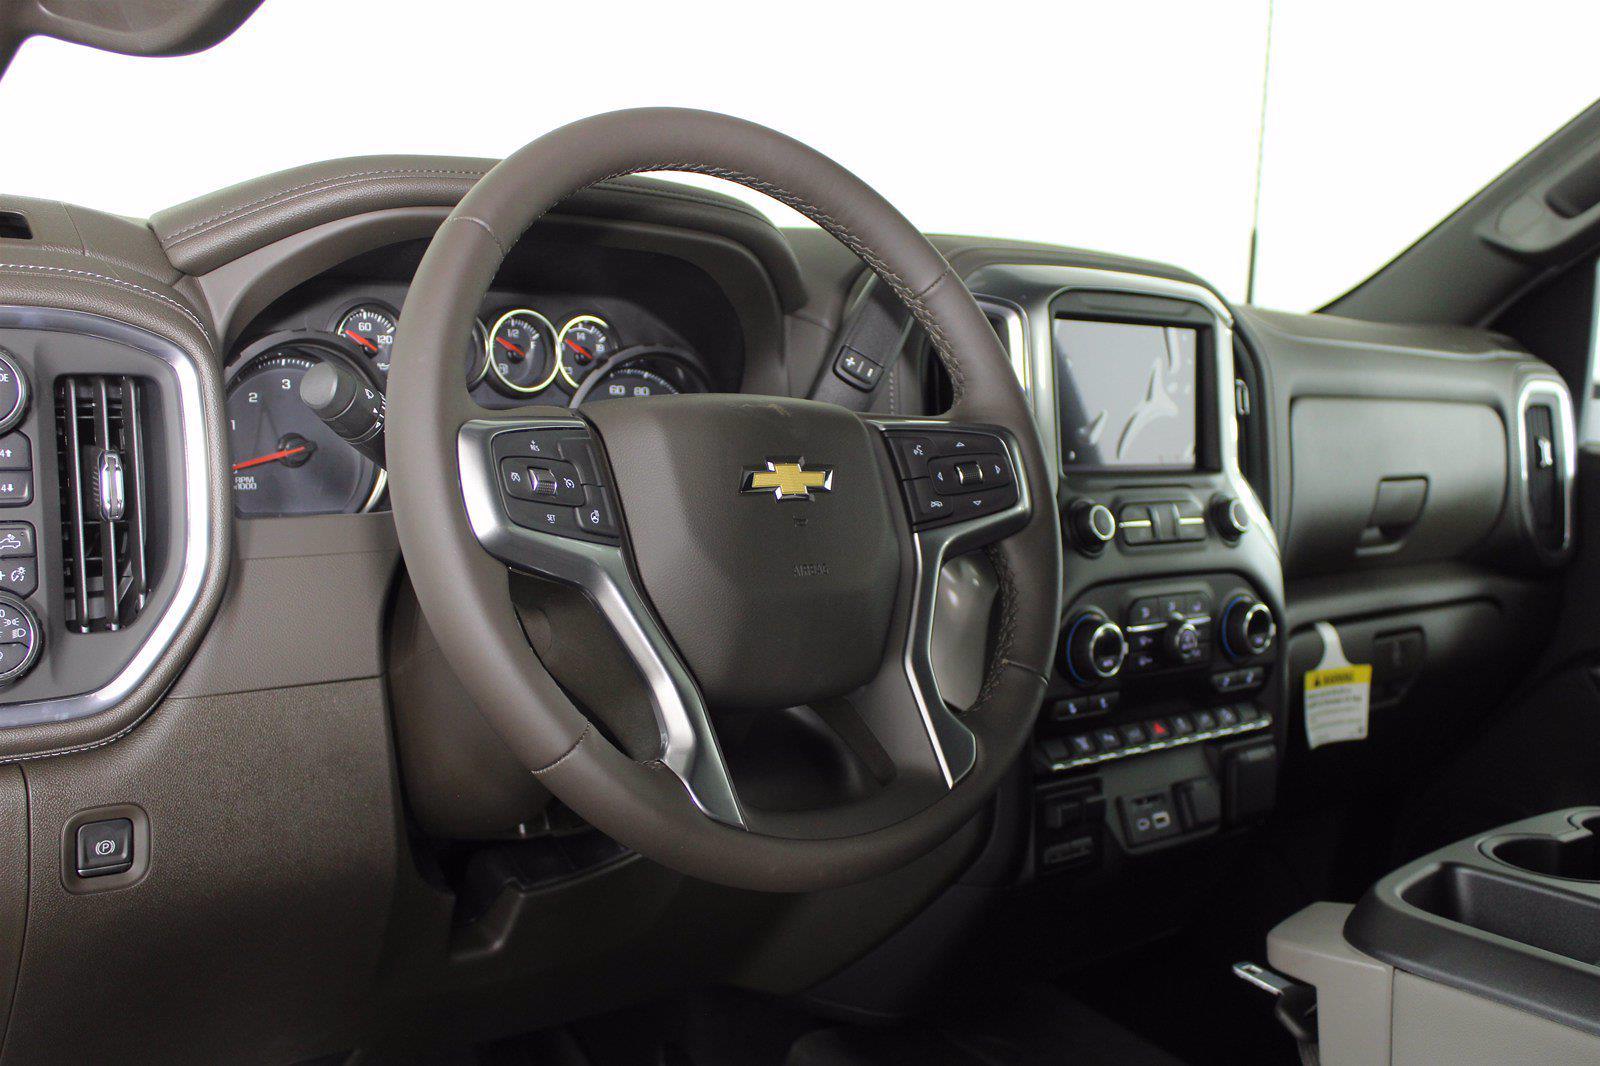 2021 Chevrolet Silverado 2500 Crew Cab 4x4, Pickup #D111097 - photo 9